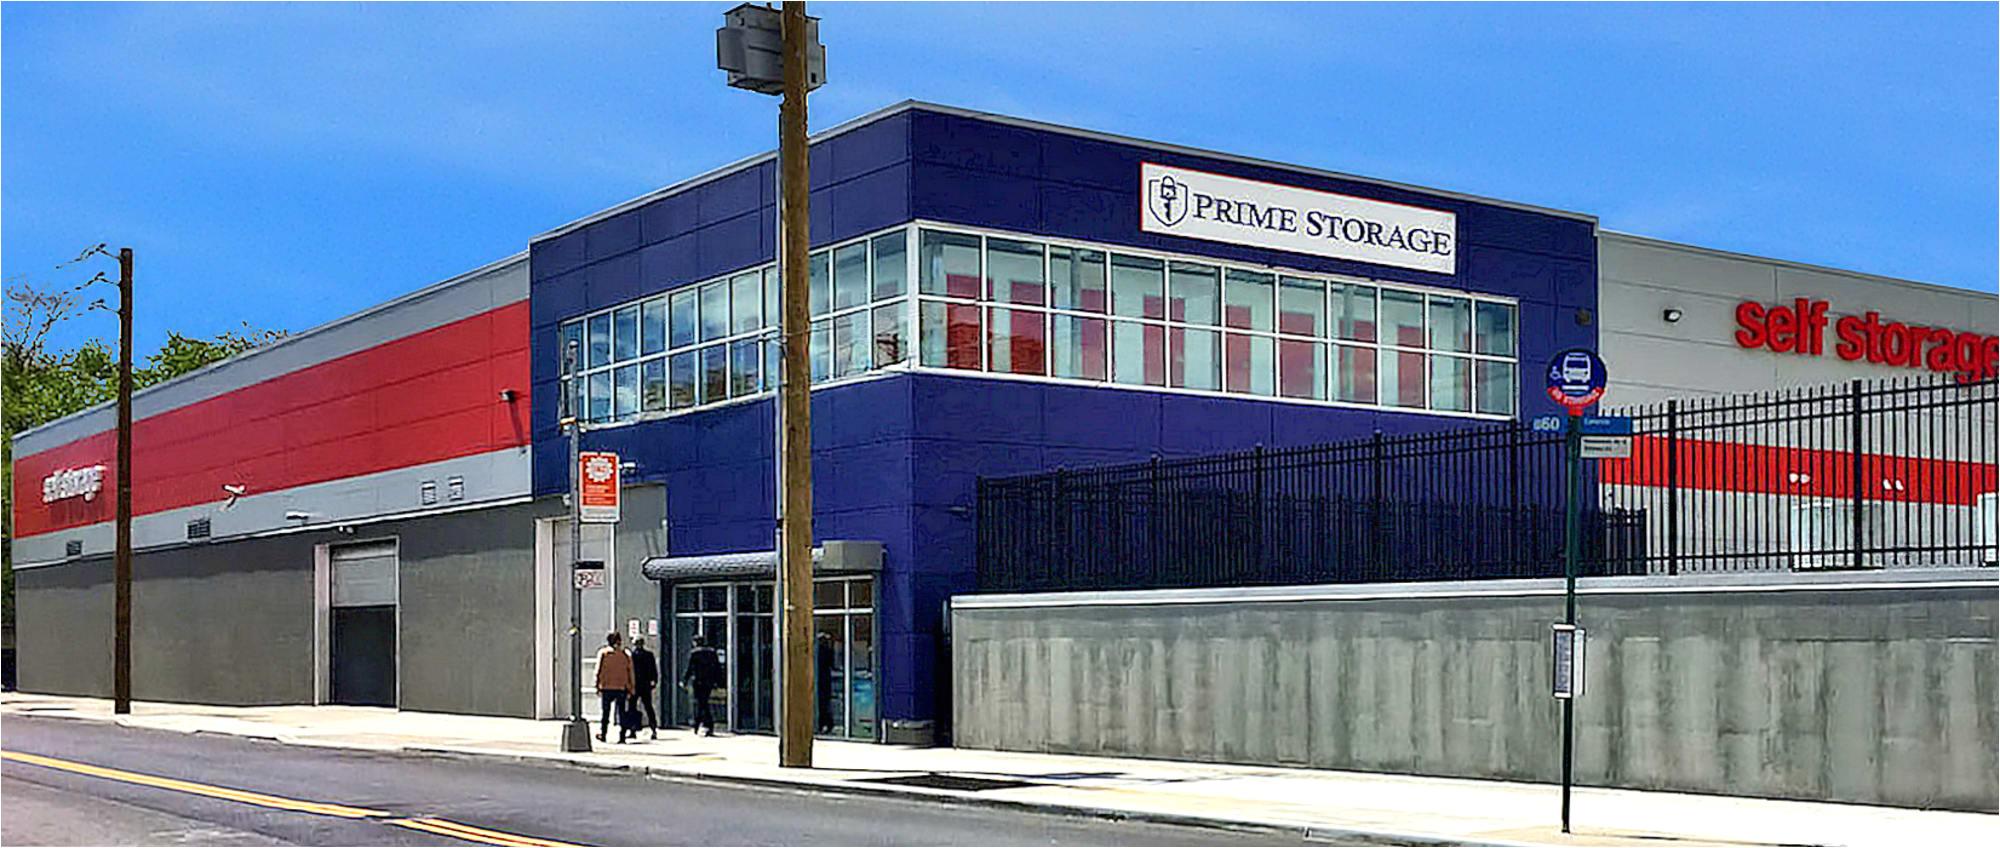 ny exterior image of prime storage in brooklyn ny